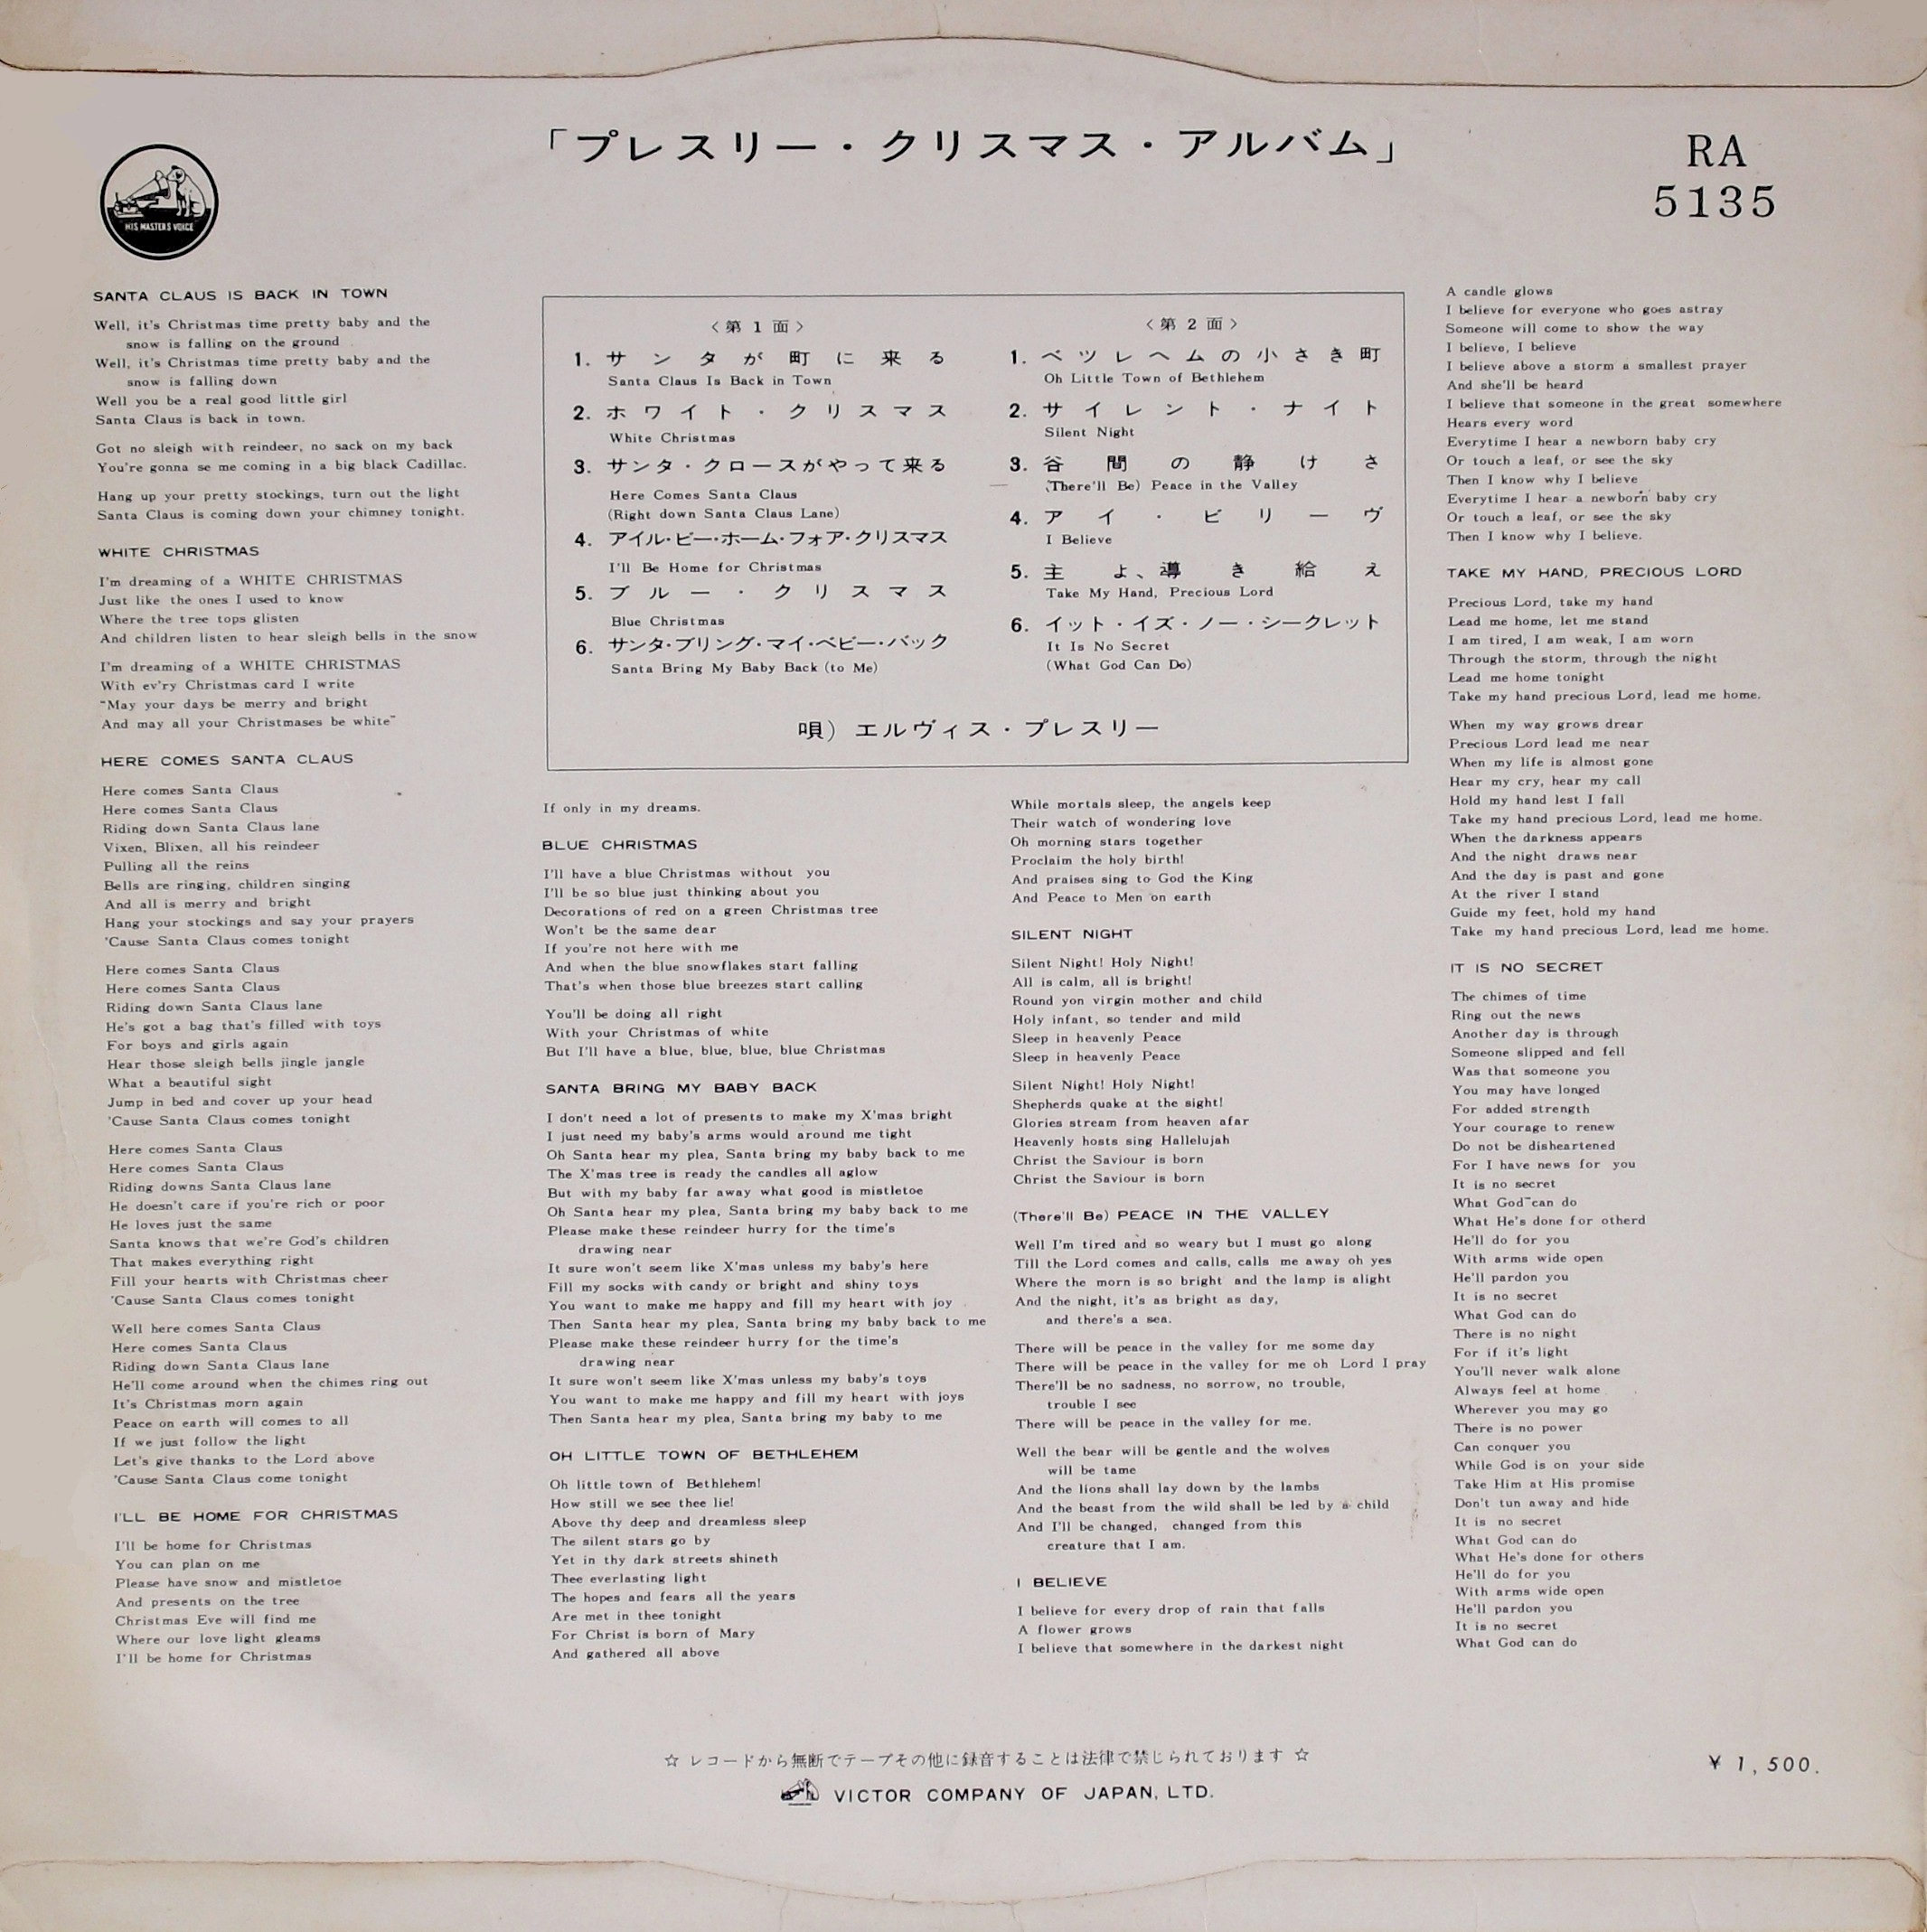 ELVIS' CHRISTMAS ALBUM 02urj67